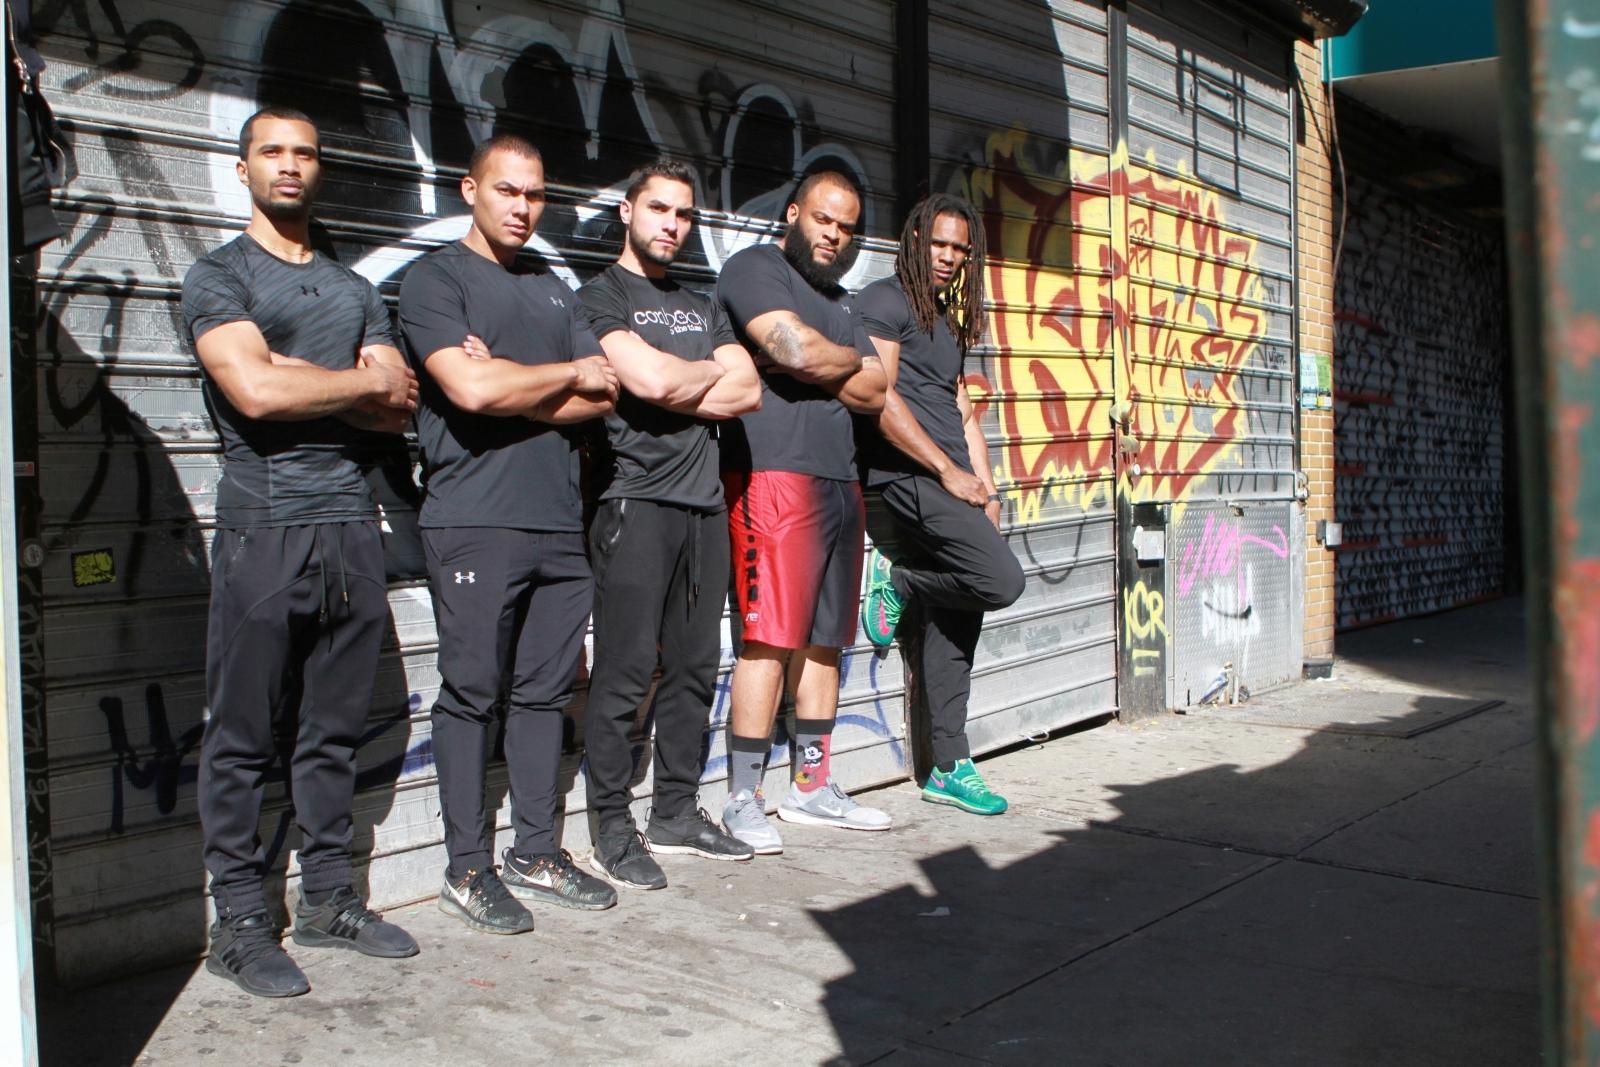 The Conbody team